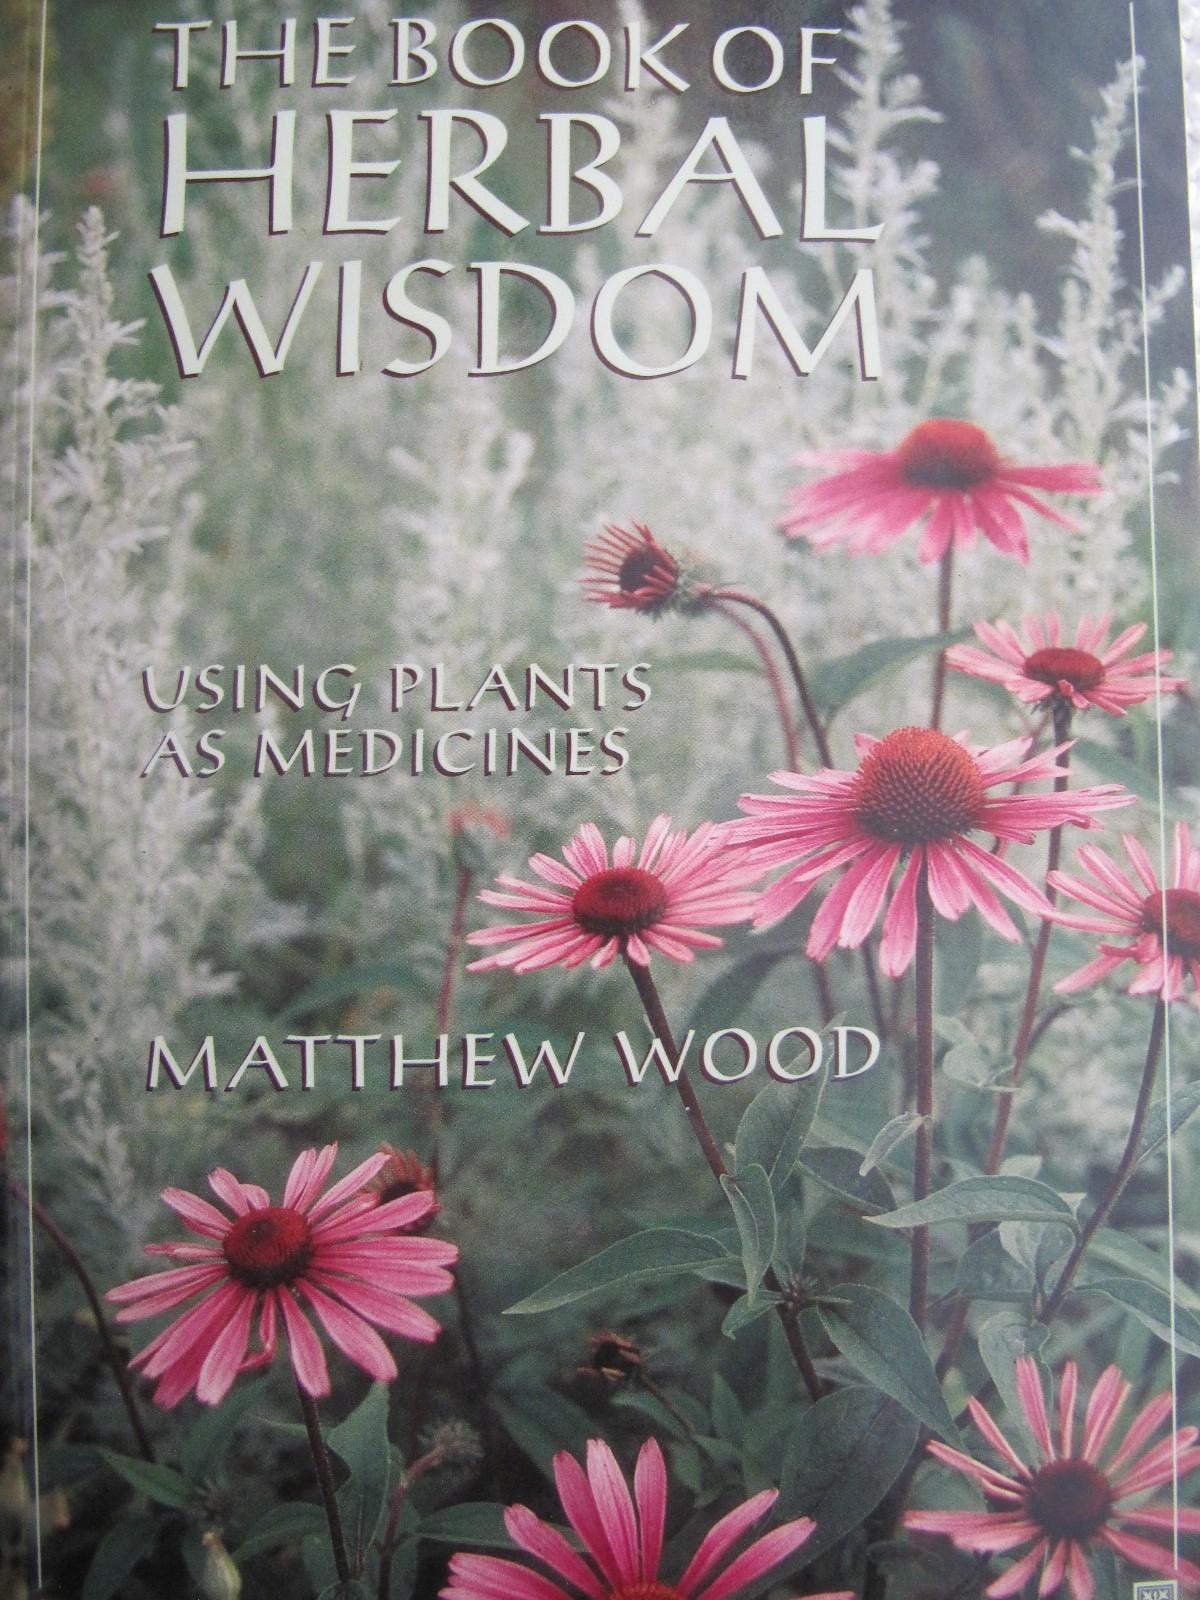 Herbal Wisdom